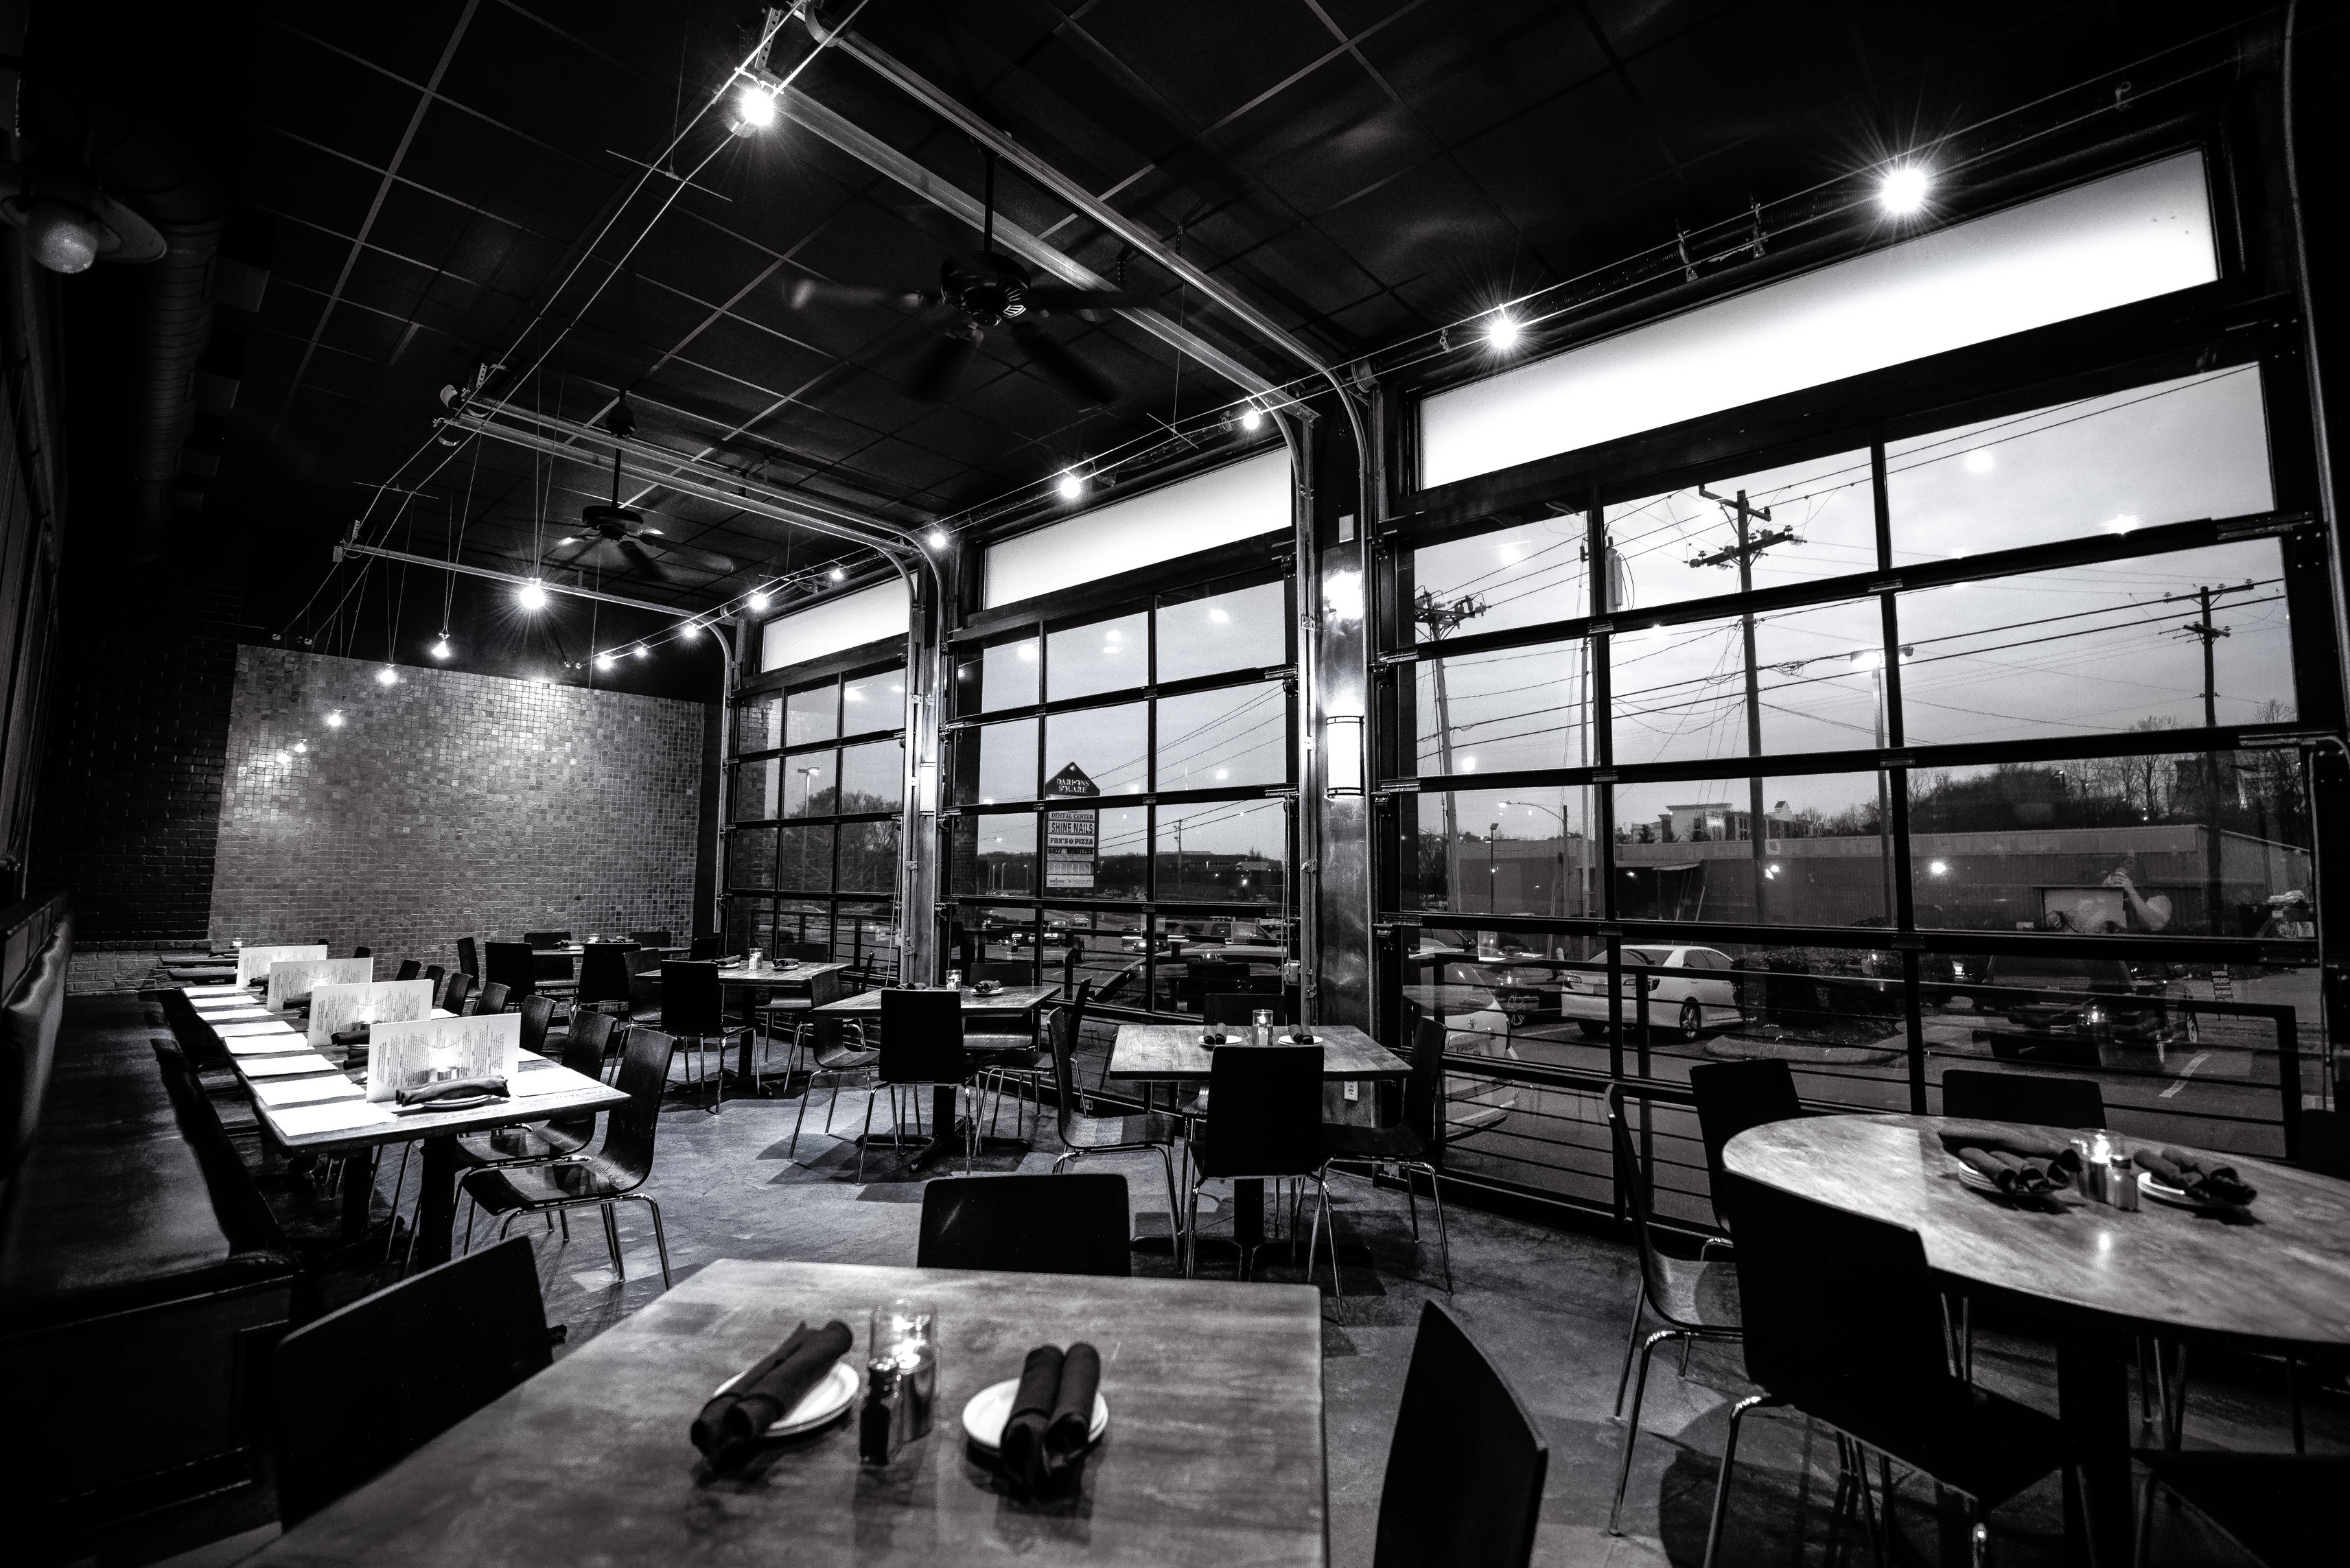 darfons-restaurant-garage-room-1r